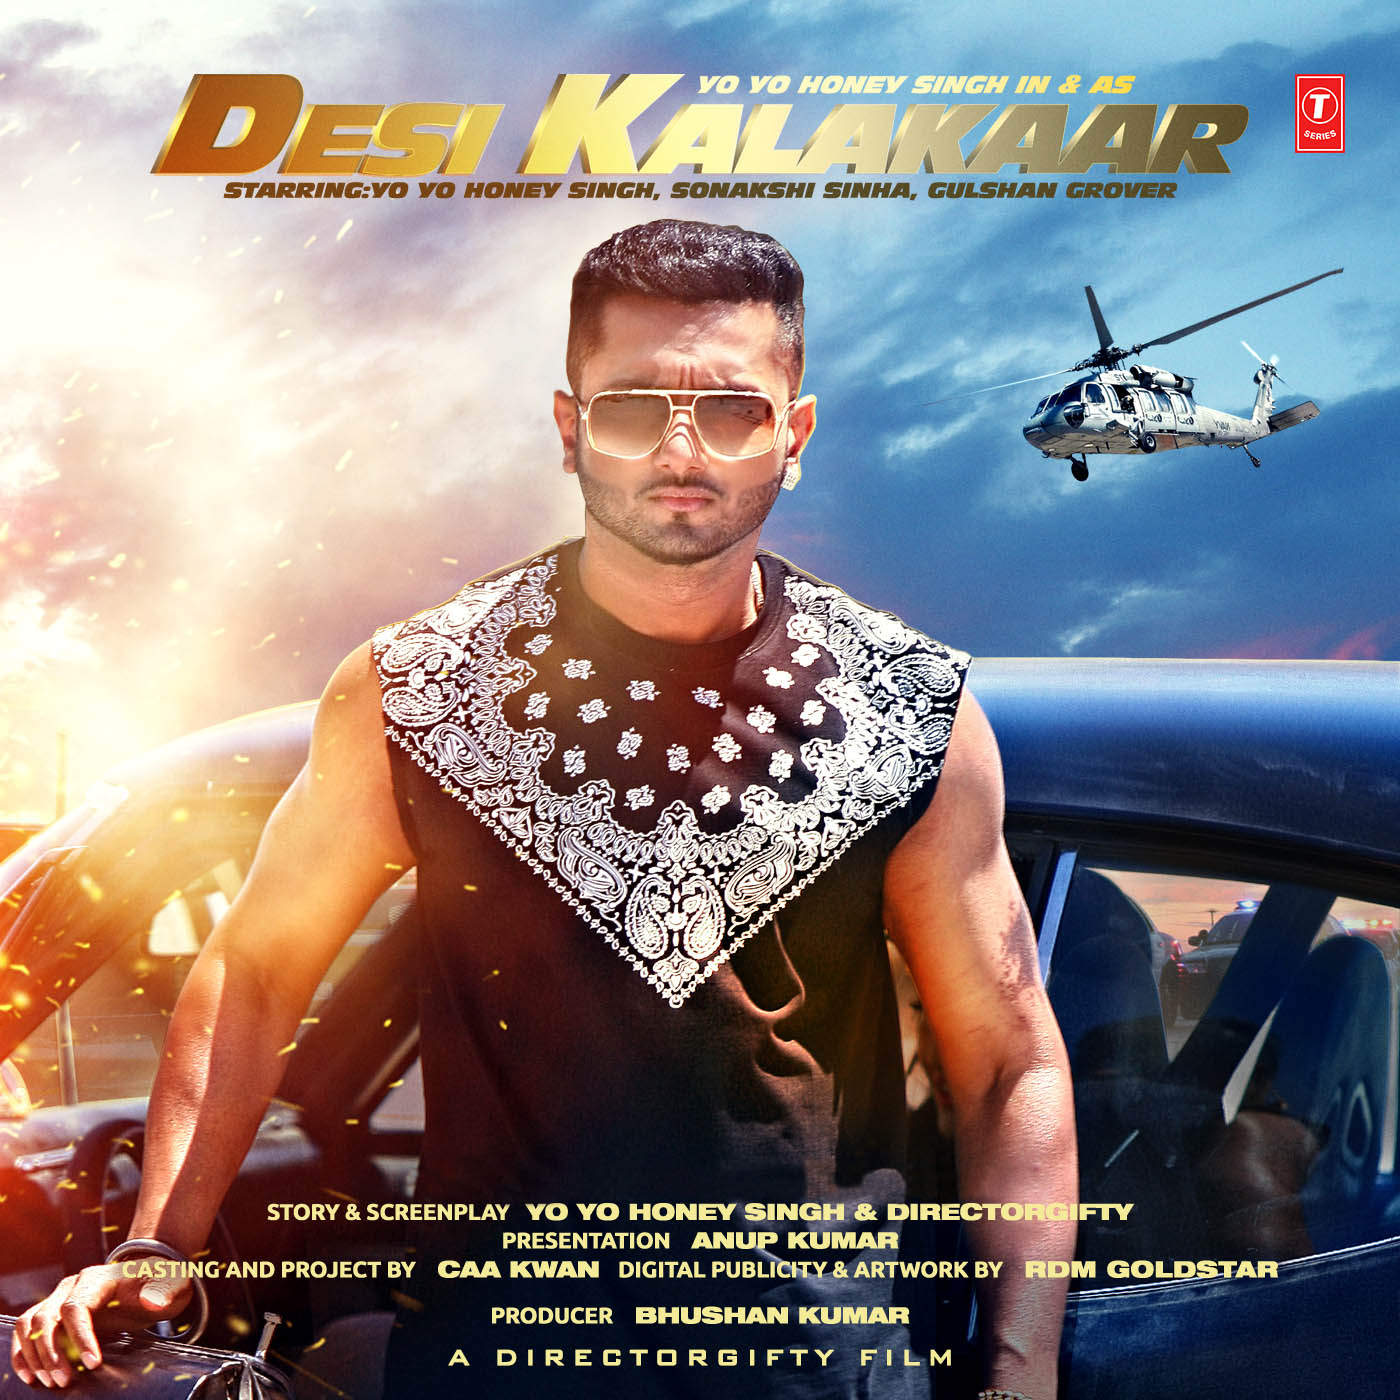 Yo Yo Honey Singh - Desi Kalakaar (Original Motion Picture Soundtrack)